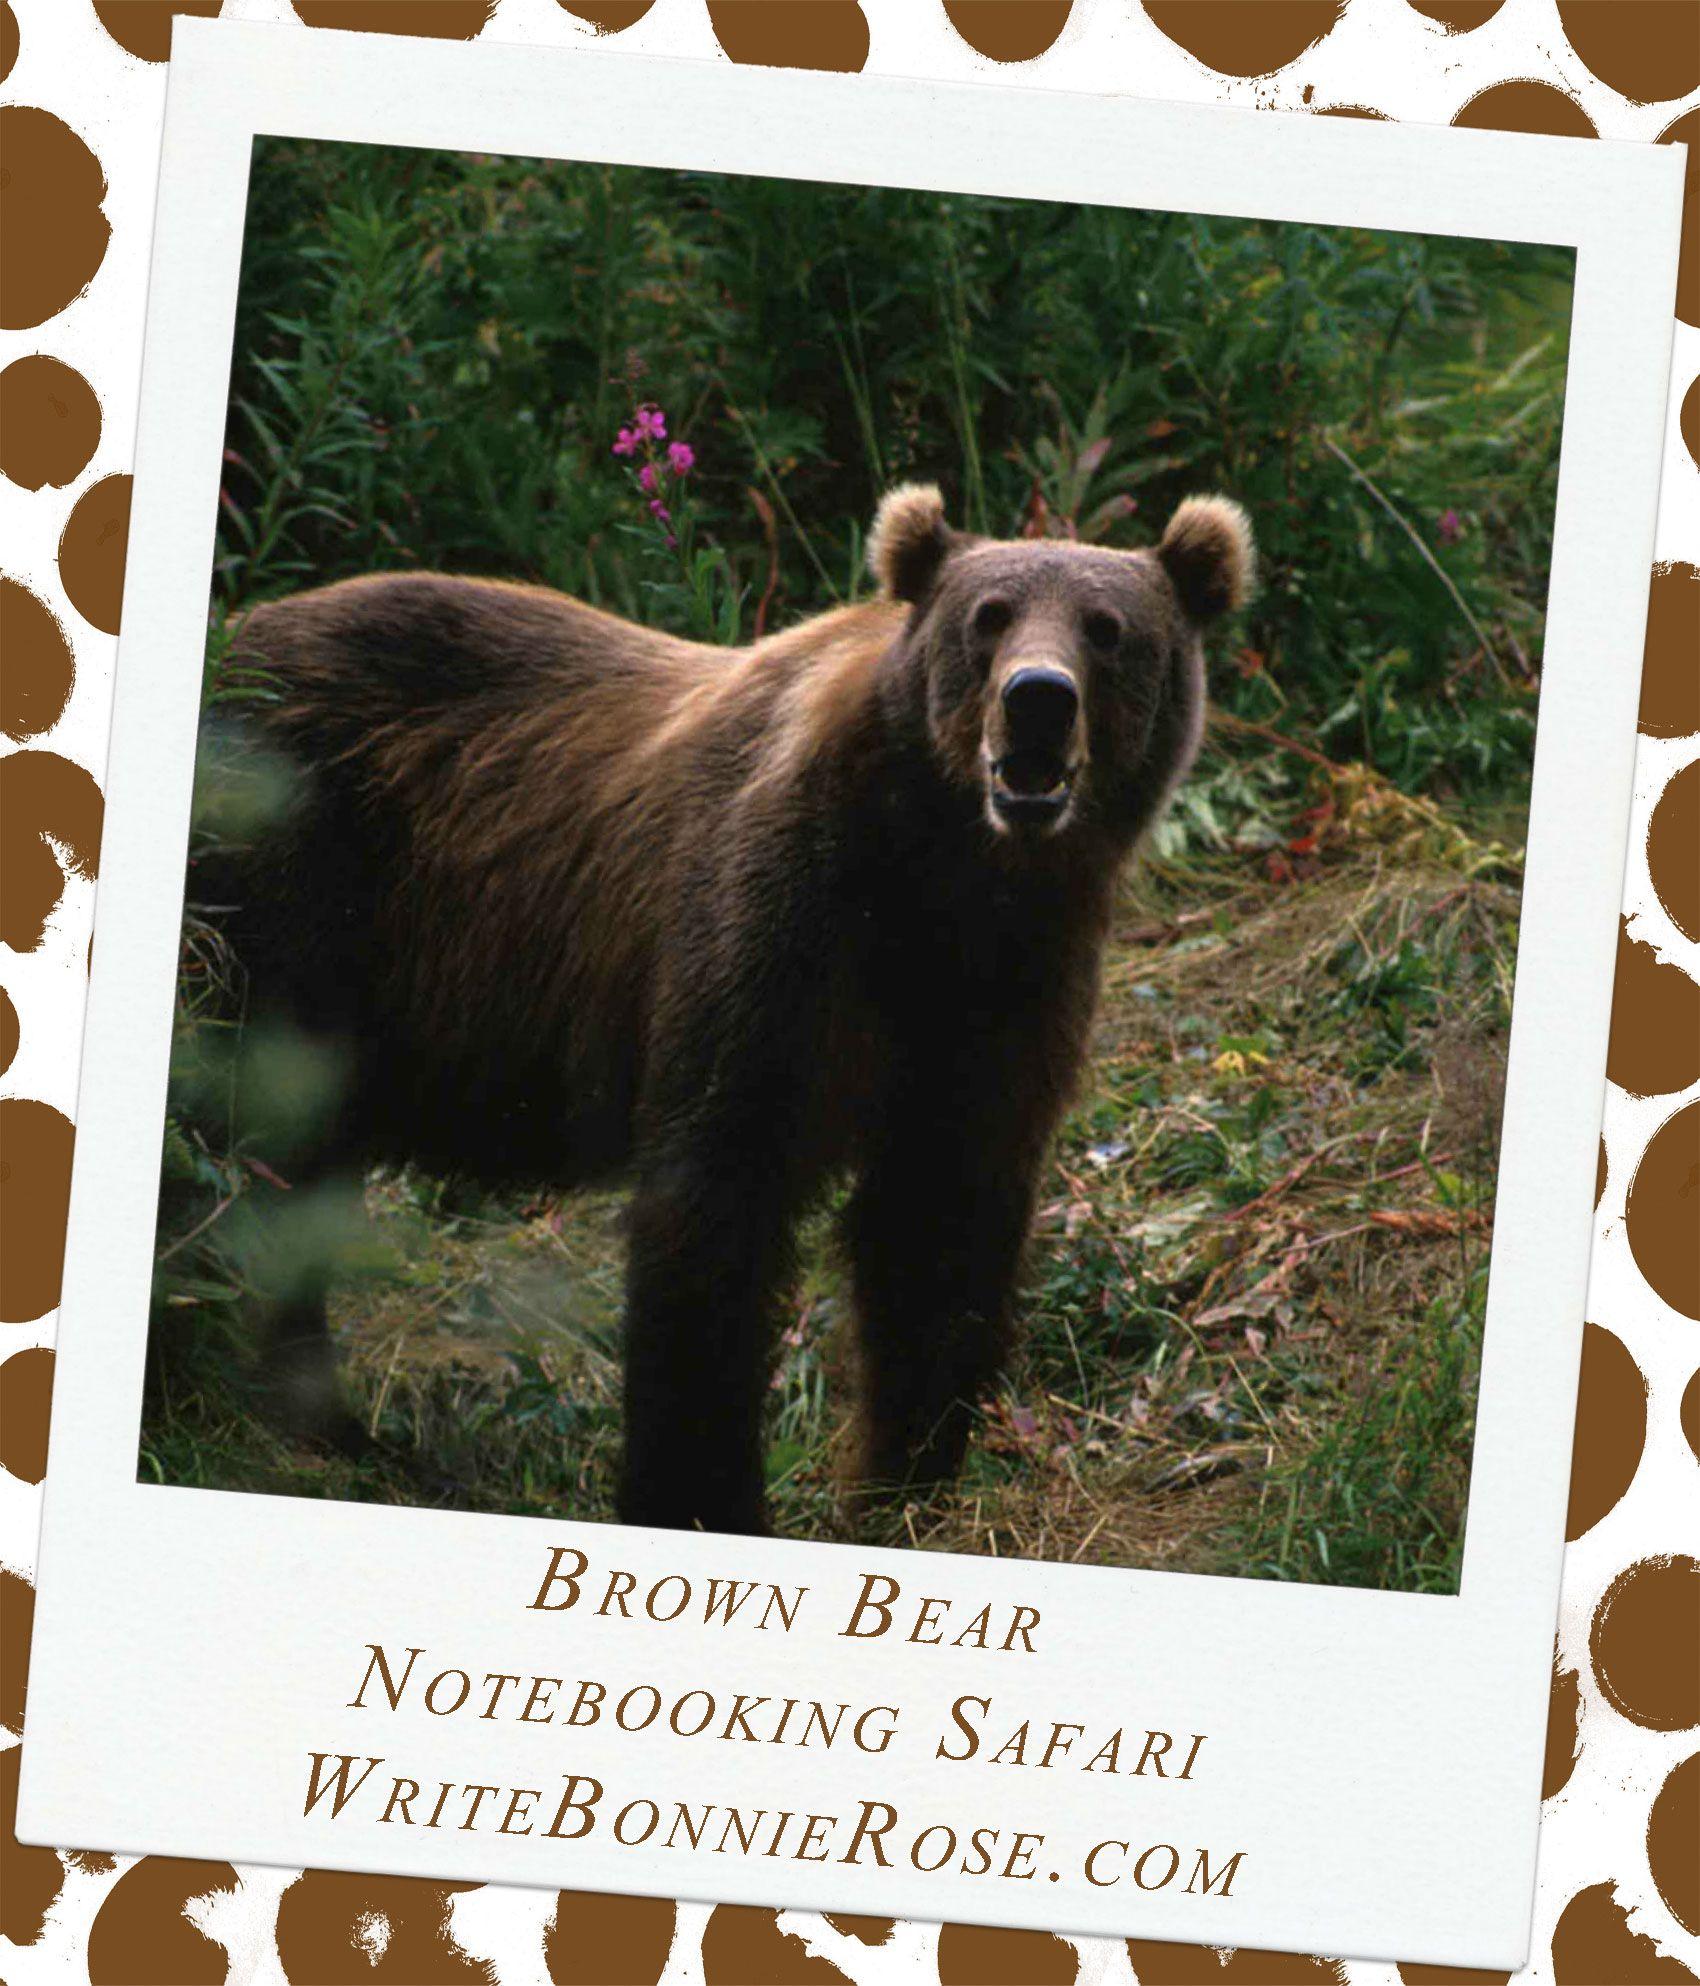 Notebooking Safari